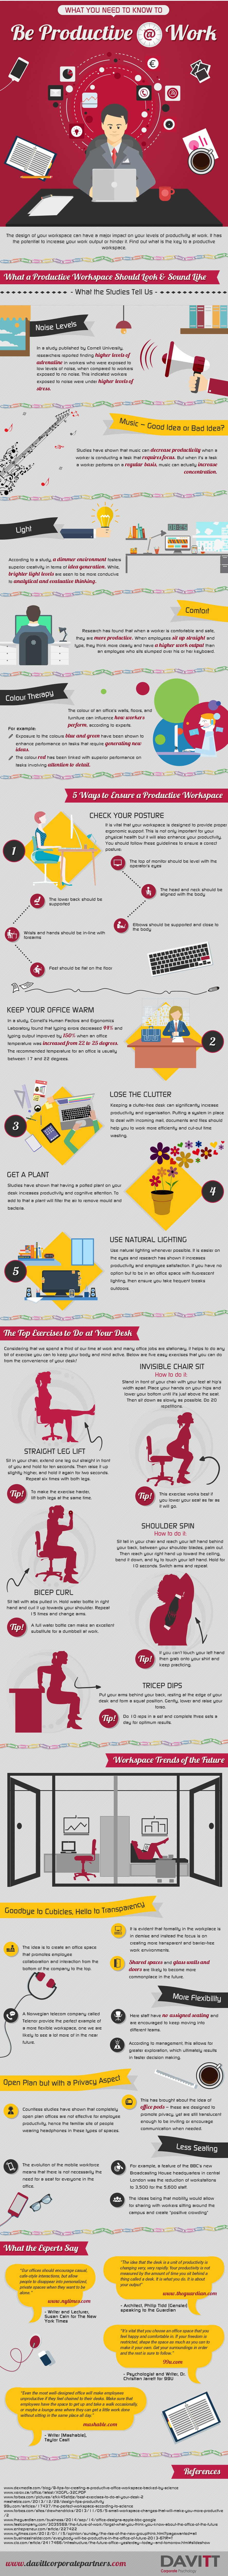 digital-marketing-infographics-17-be-more-productive.jpg